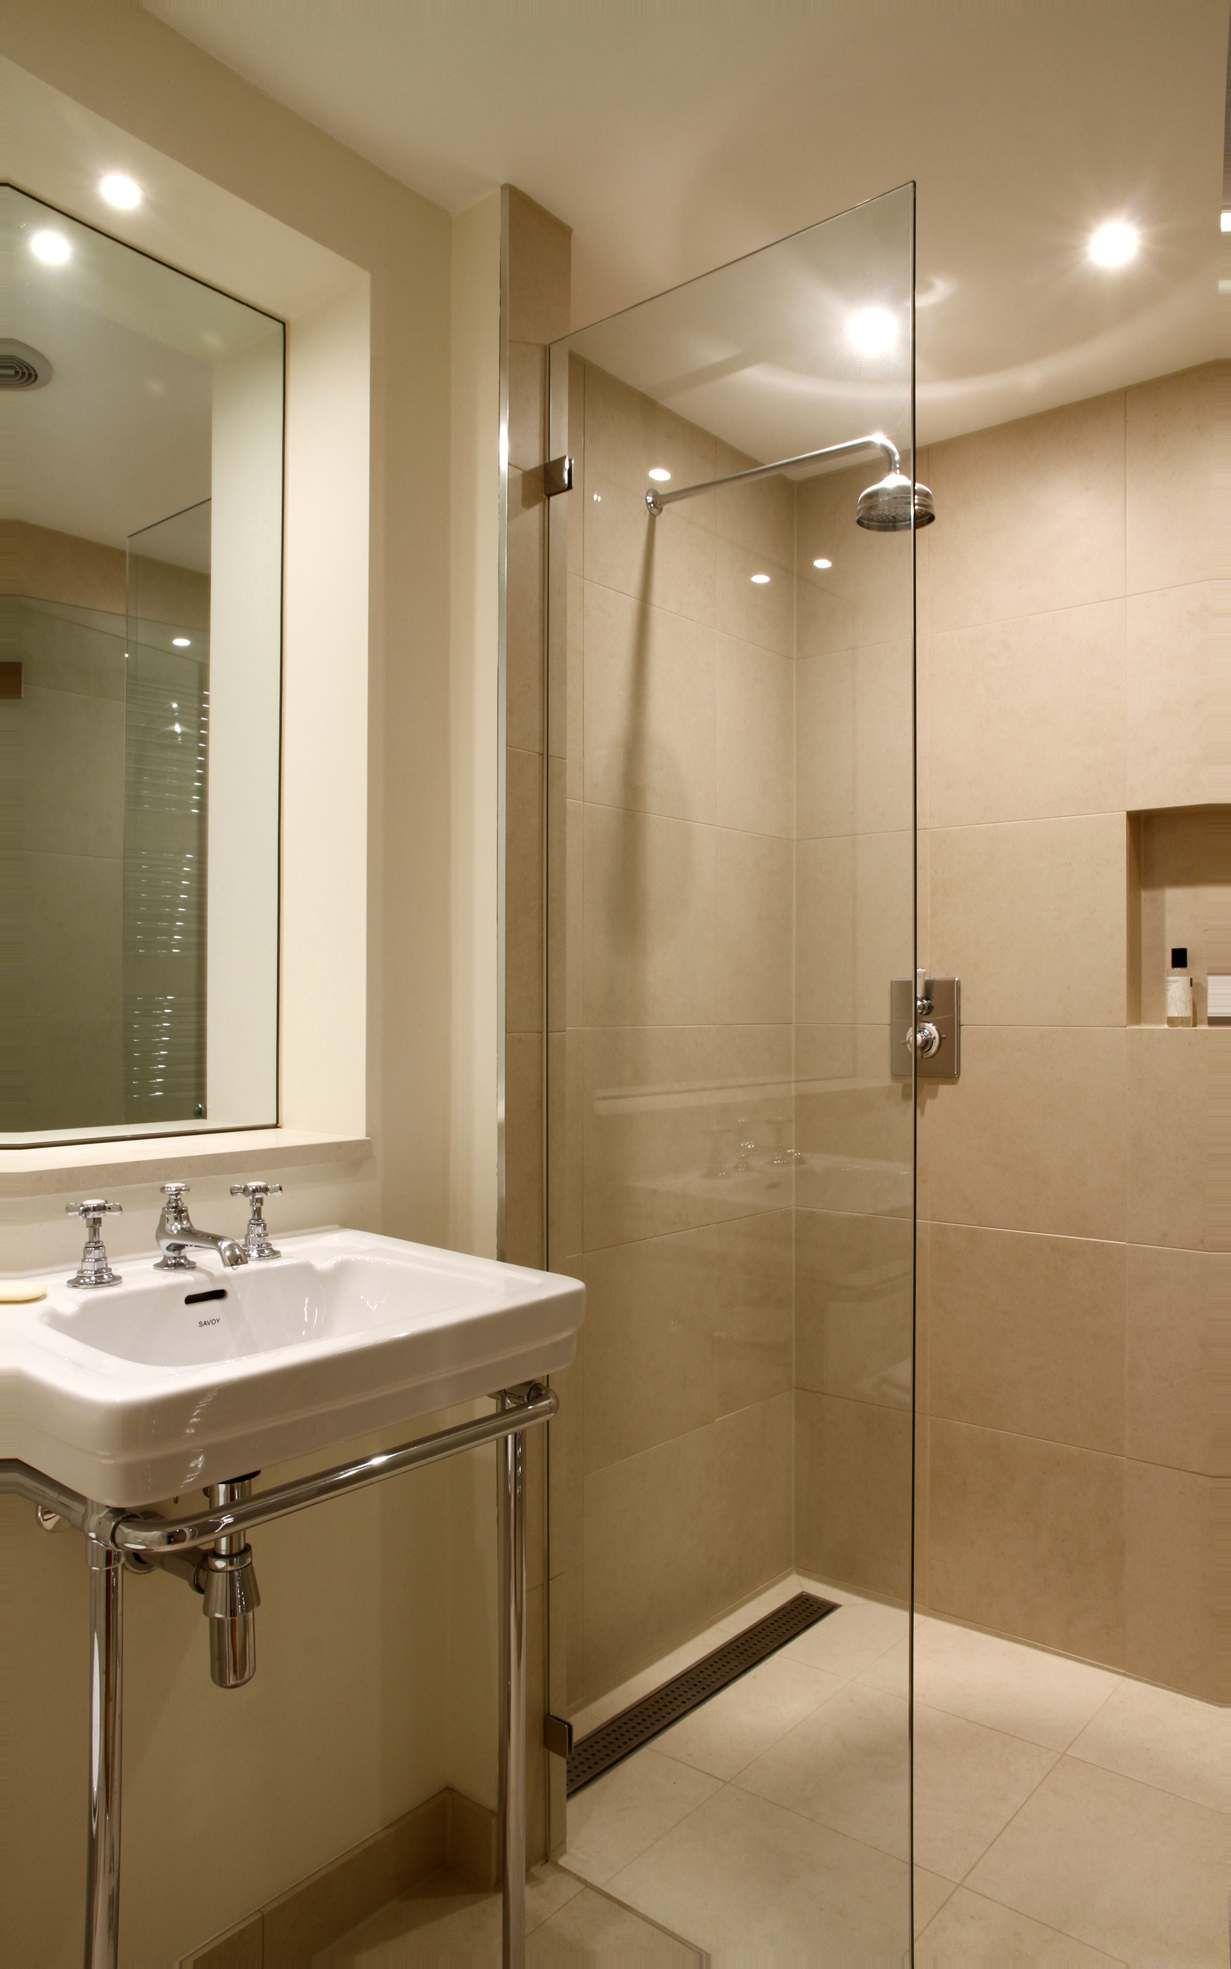 Basement bathroom glass wall and long drain. Feels airy